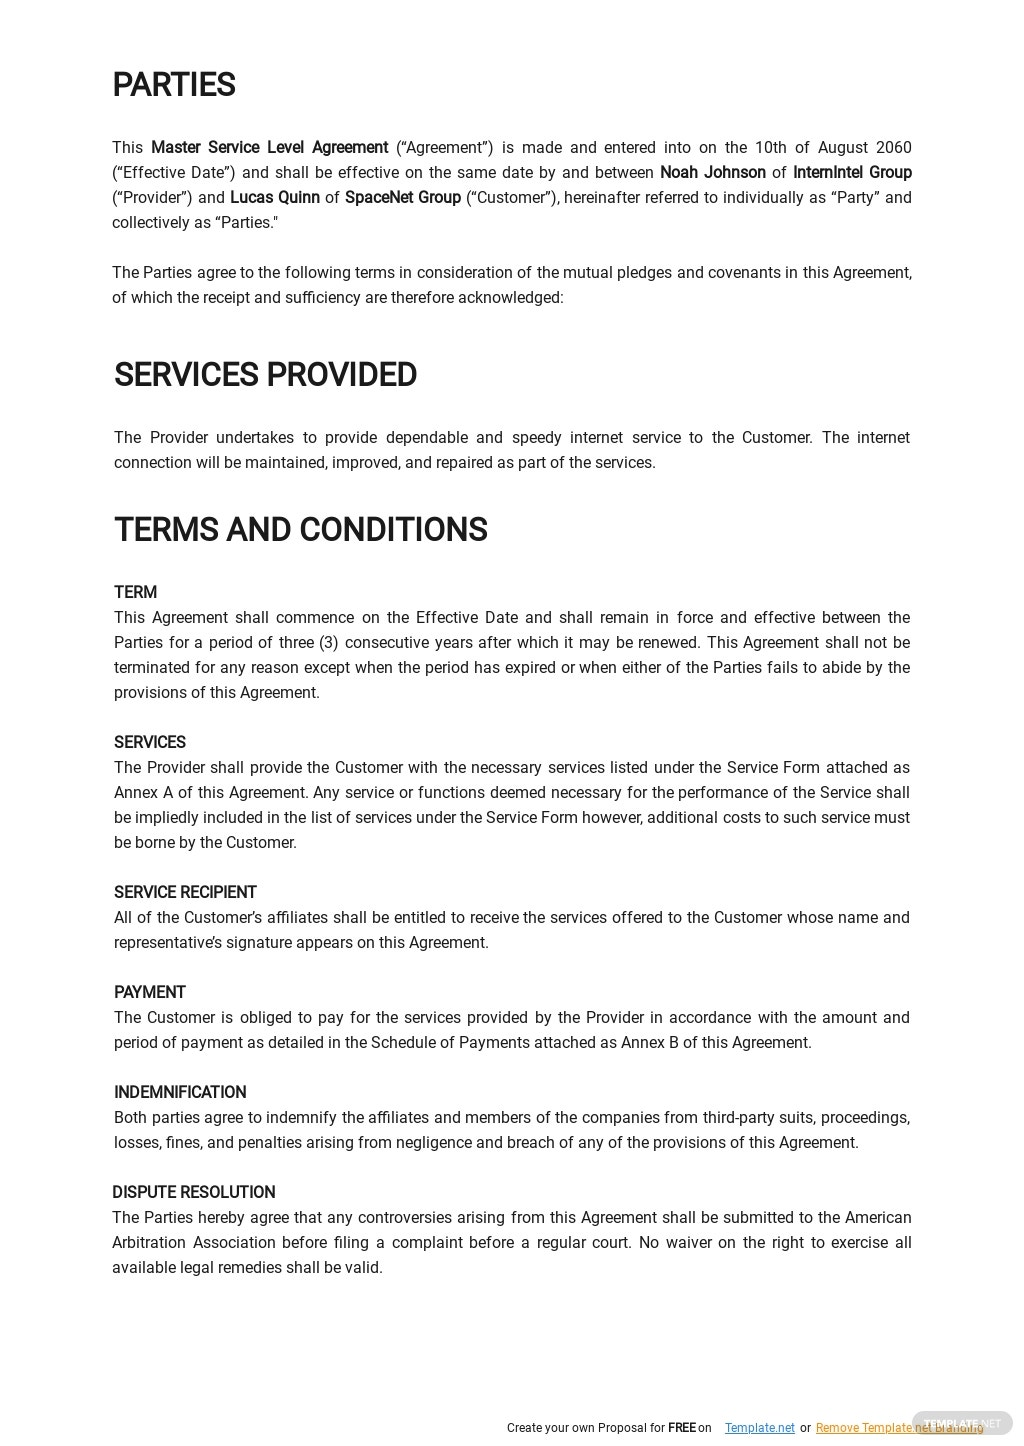 Master Service Level Agreement Template  1.jpe